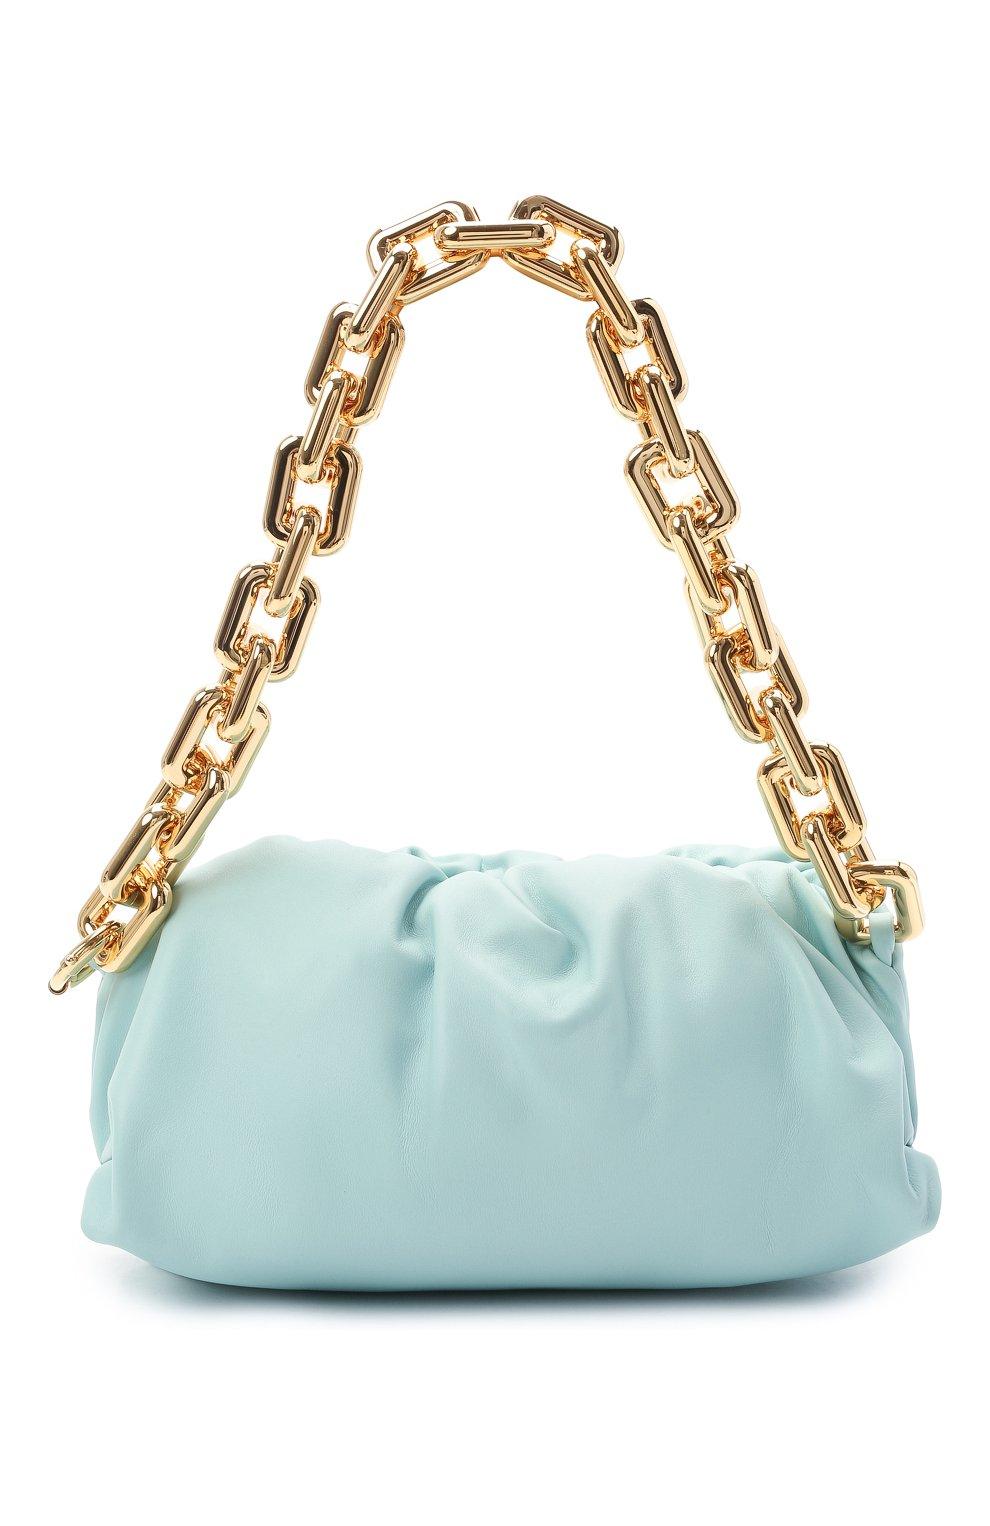 Женская сумка chain pouch BOTTEGA VENETA светло-голубого цвета, арт. 620230/VCP40 | Фото 1